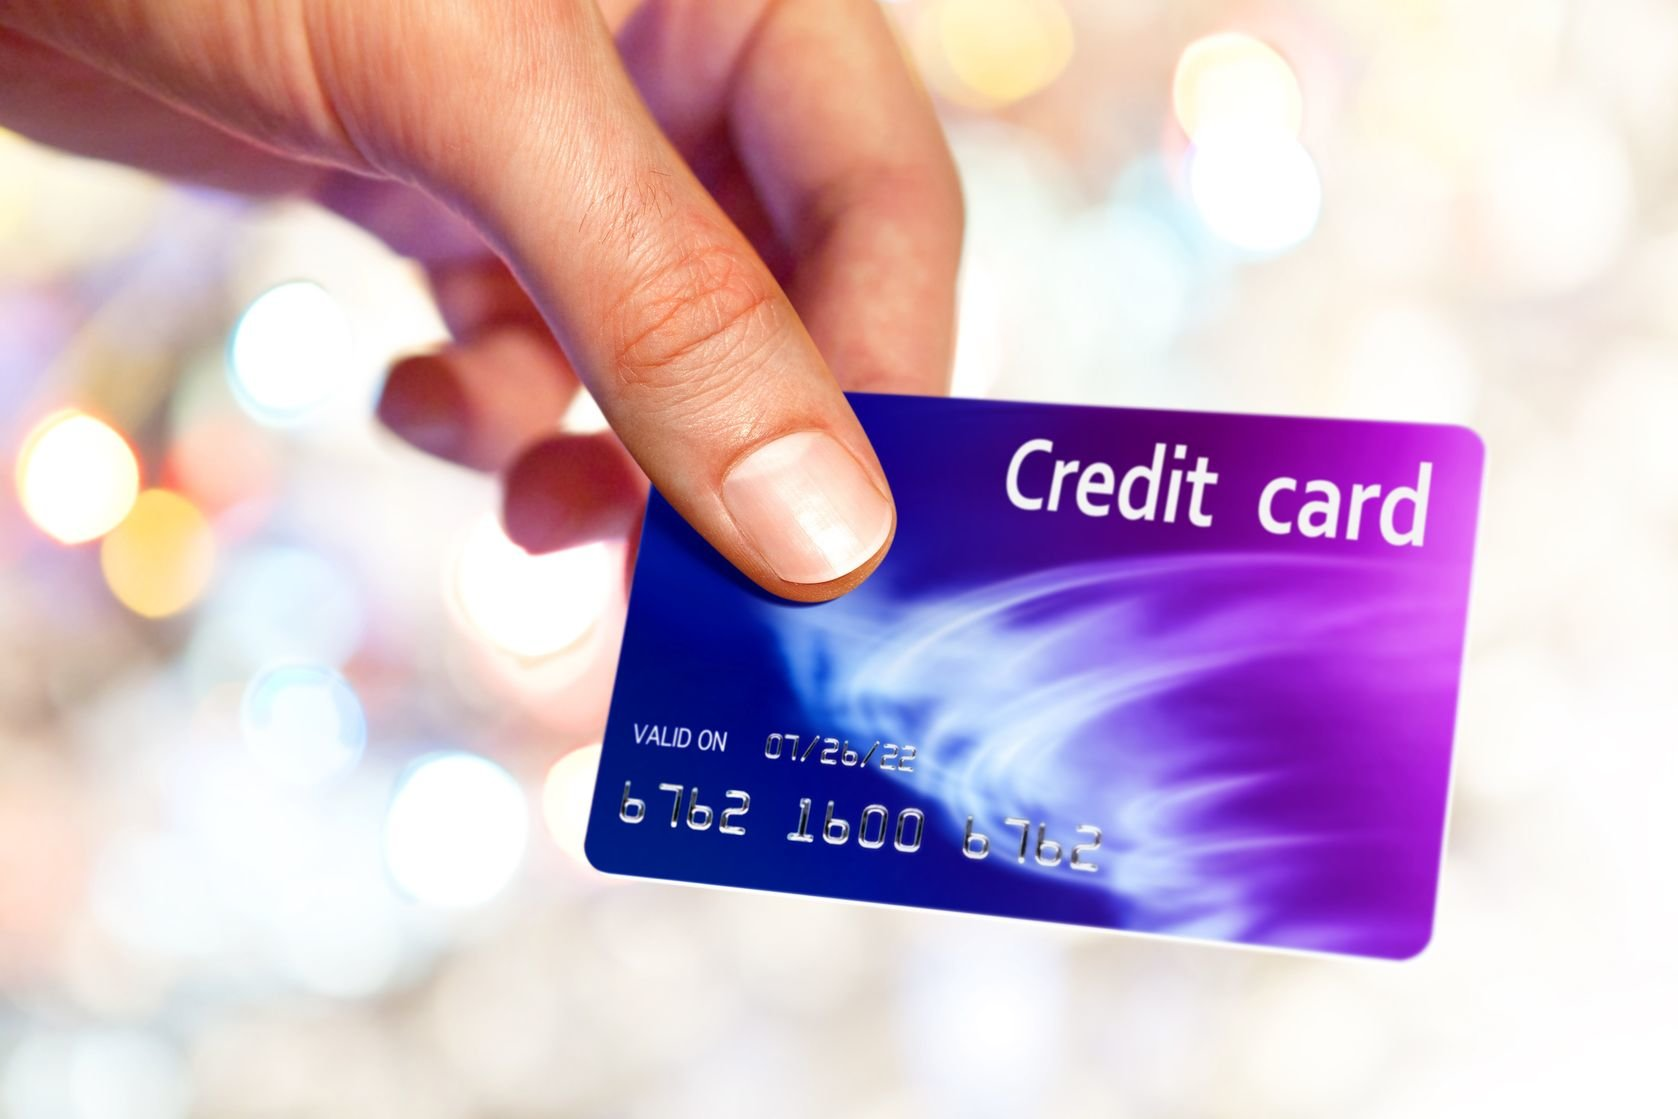 kreditnaya-karta-s-ploxoj-kreditnoj-istoriej_1